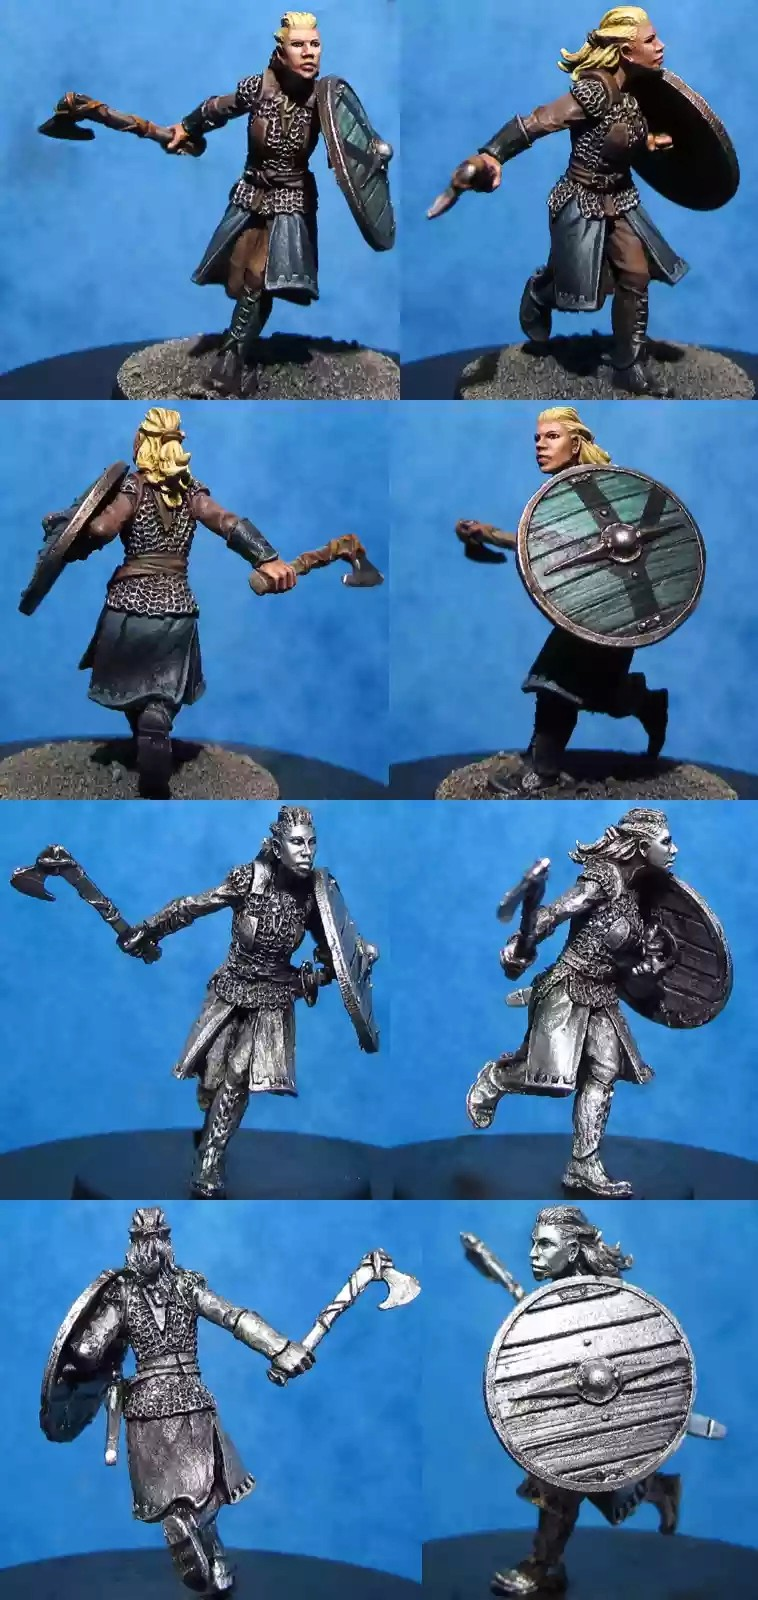 [Saga] La série Vikings en miniature Hfh11610